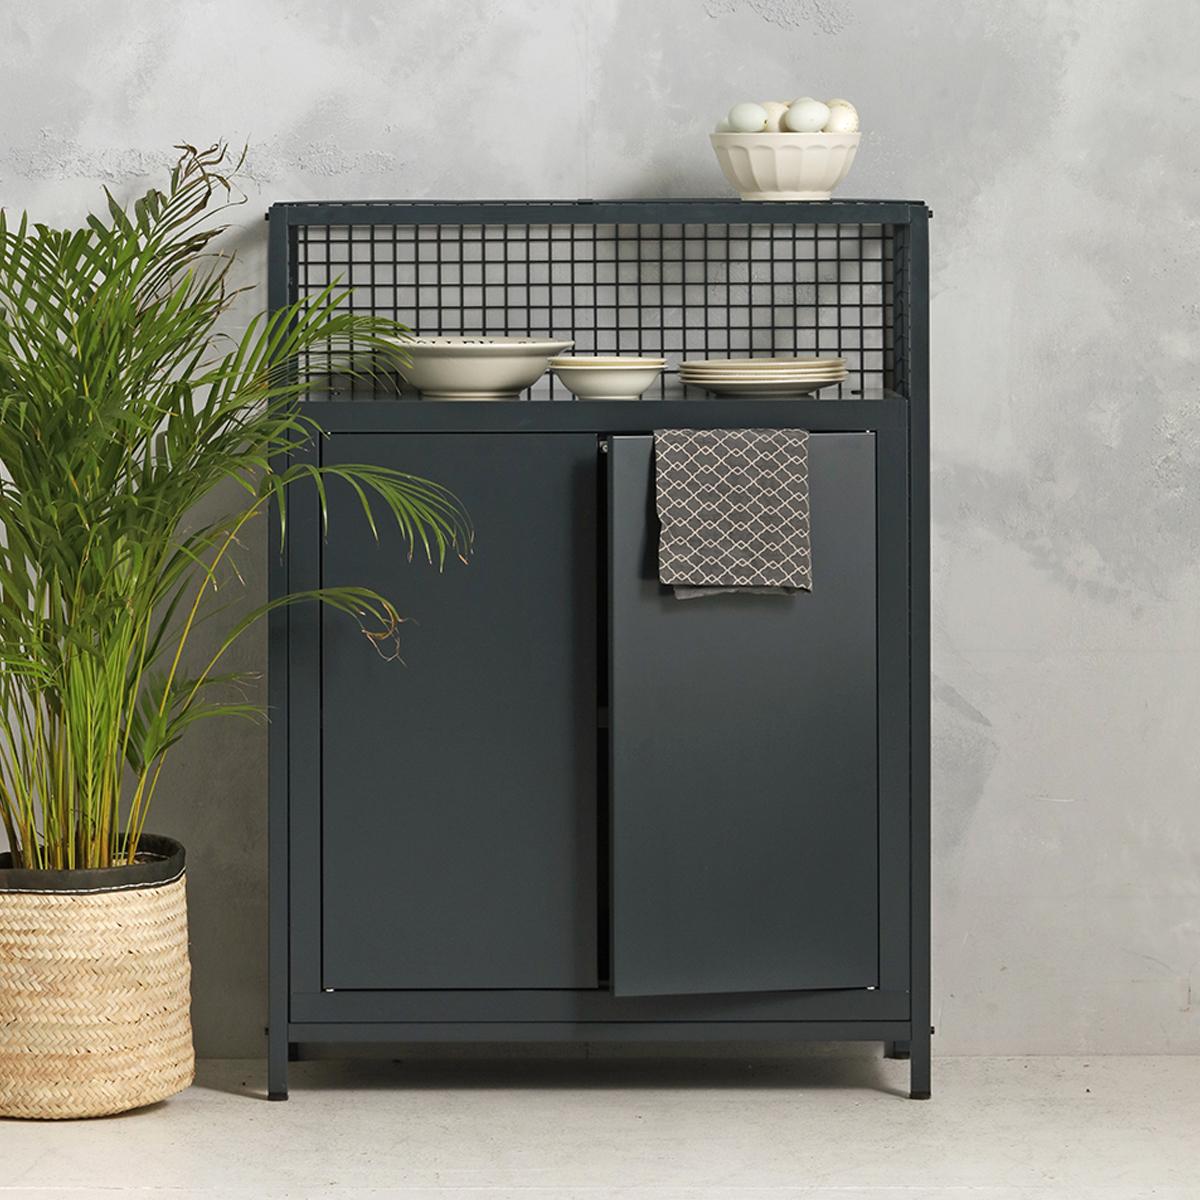 Industrieel dressoir - antraciet - 115x85.3x44.5 cm - LCS-103